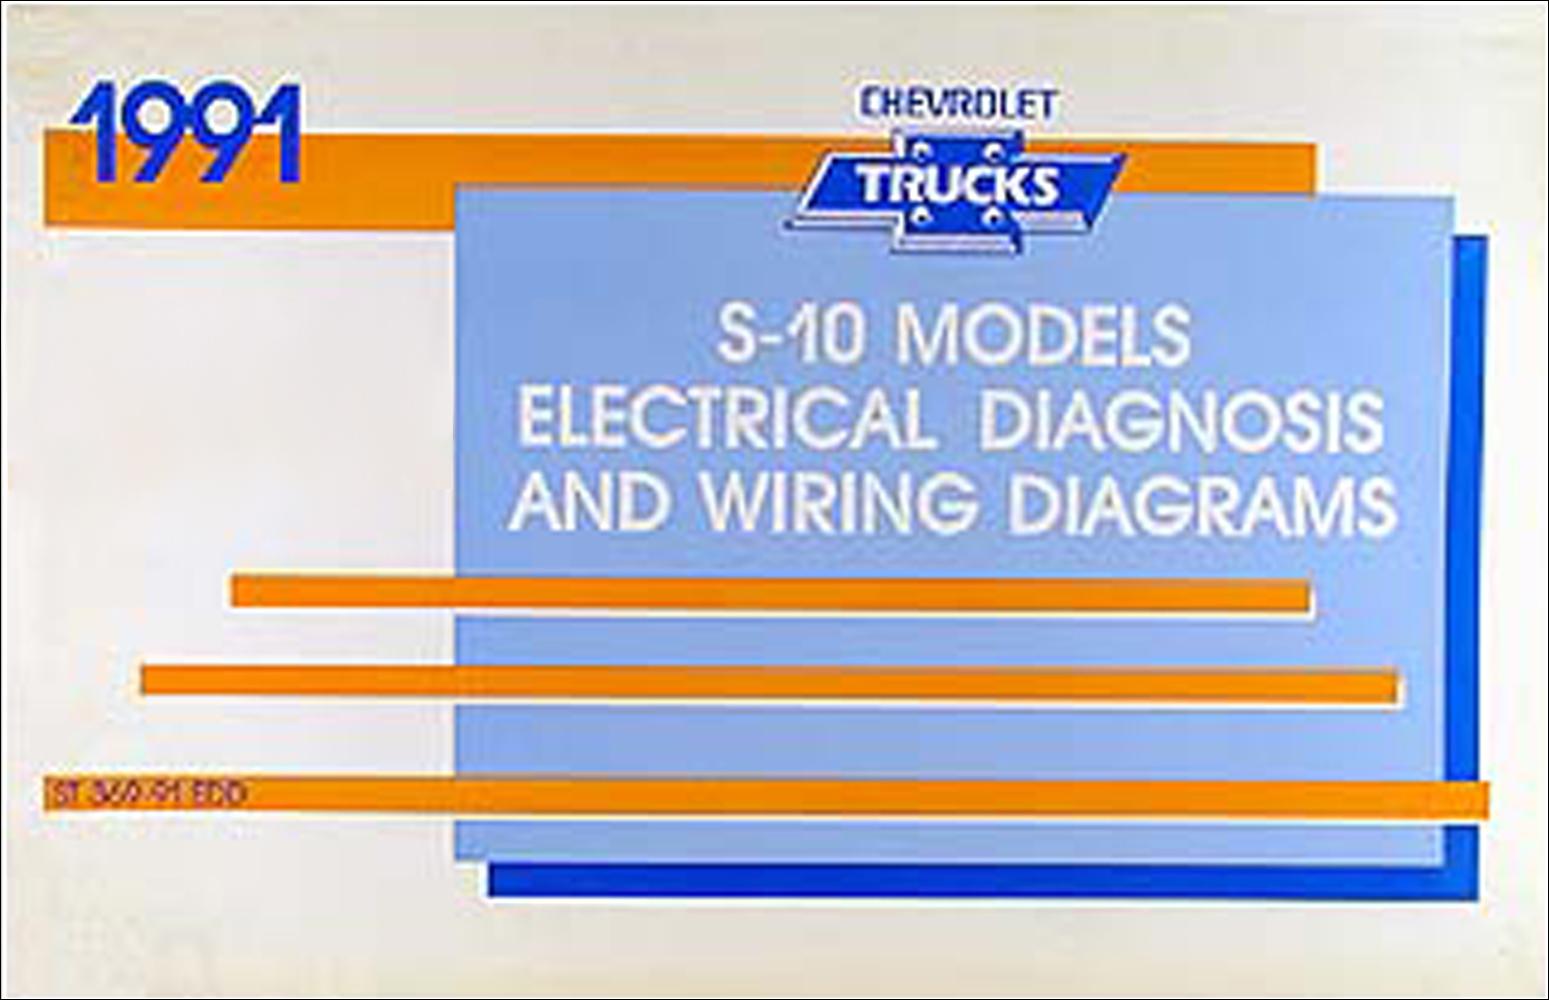 1992 chevy s10 radio wiring diagram venn cartoon happy face 1991 s 10 all data pickup blazer manual original 2001